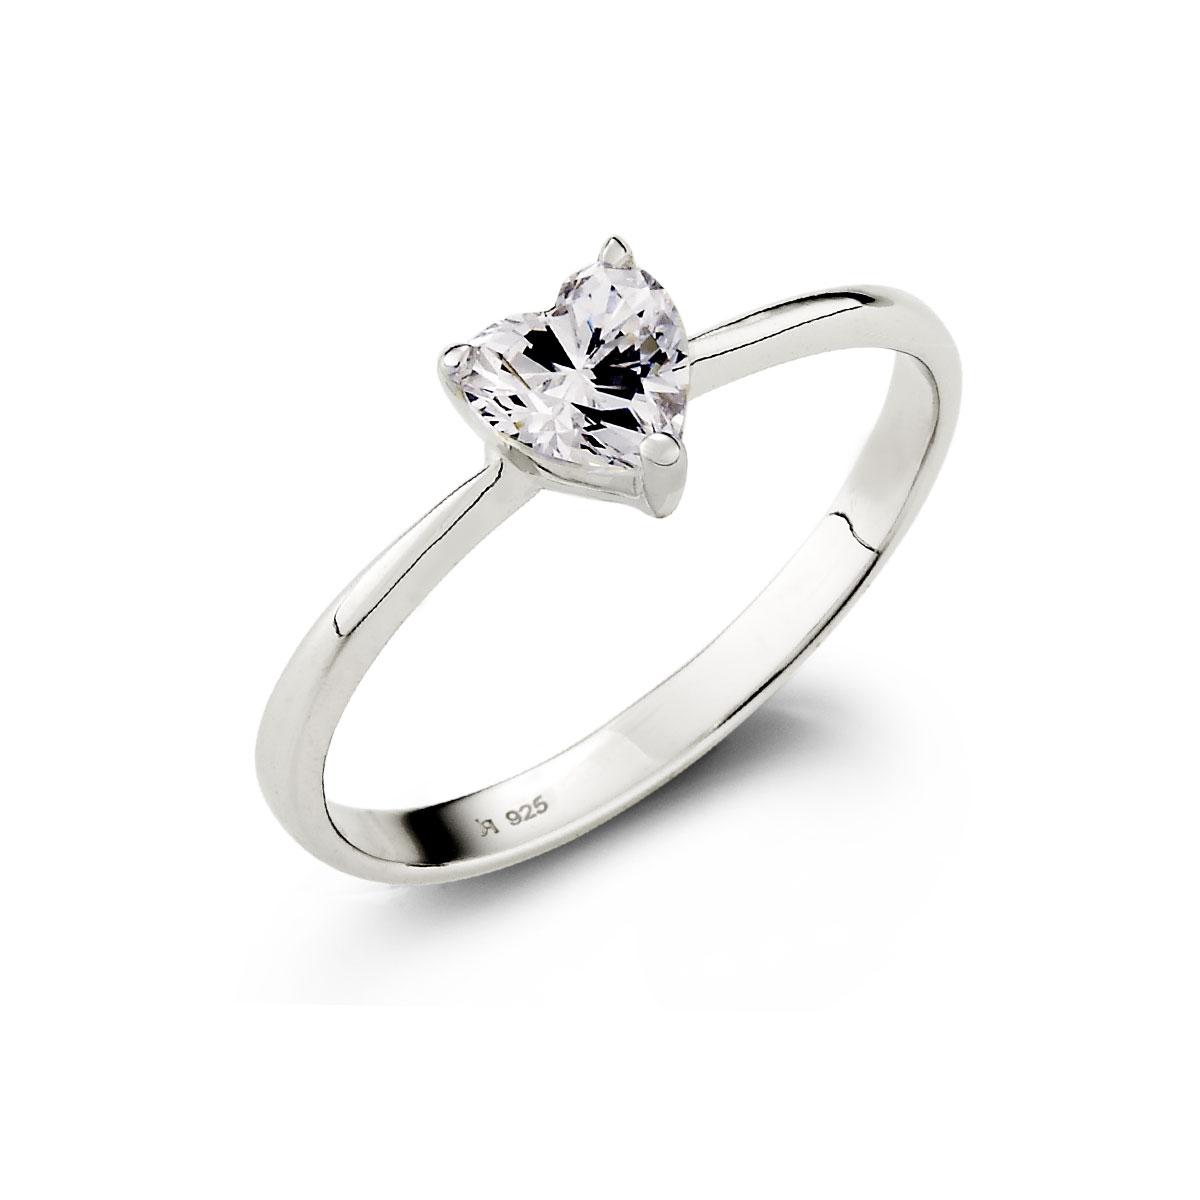 KSW43 維納斯單鑽經典戒指